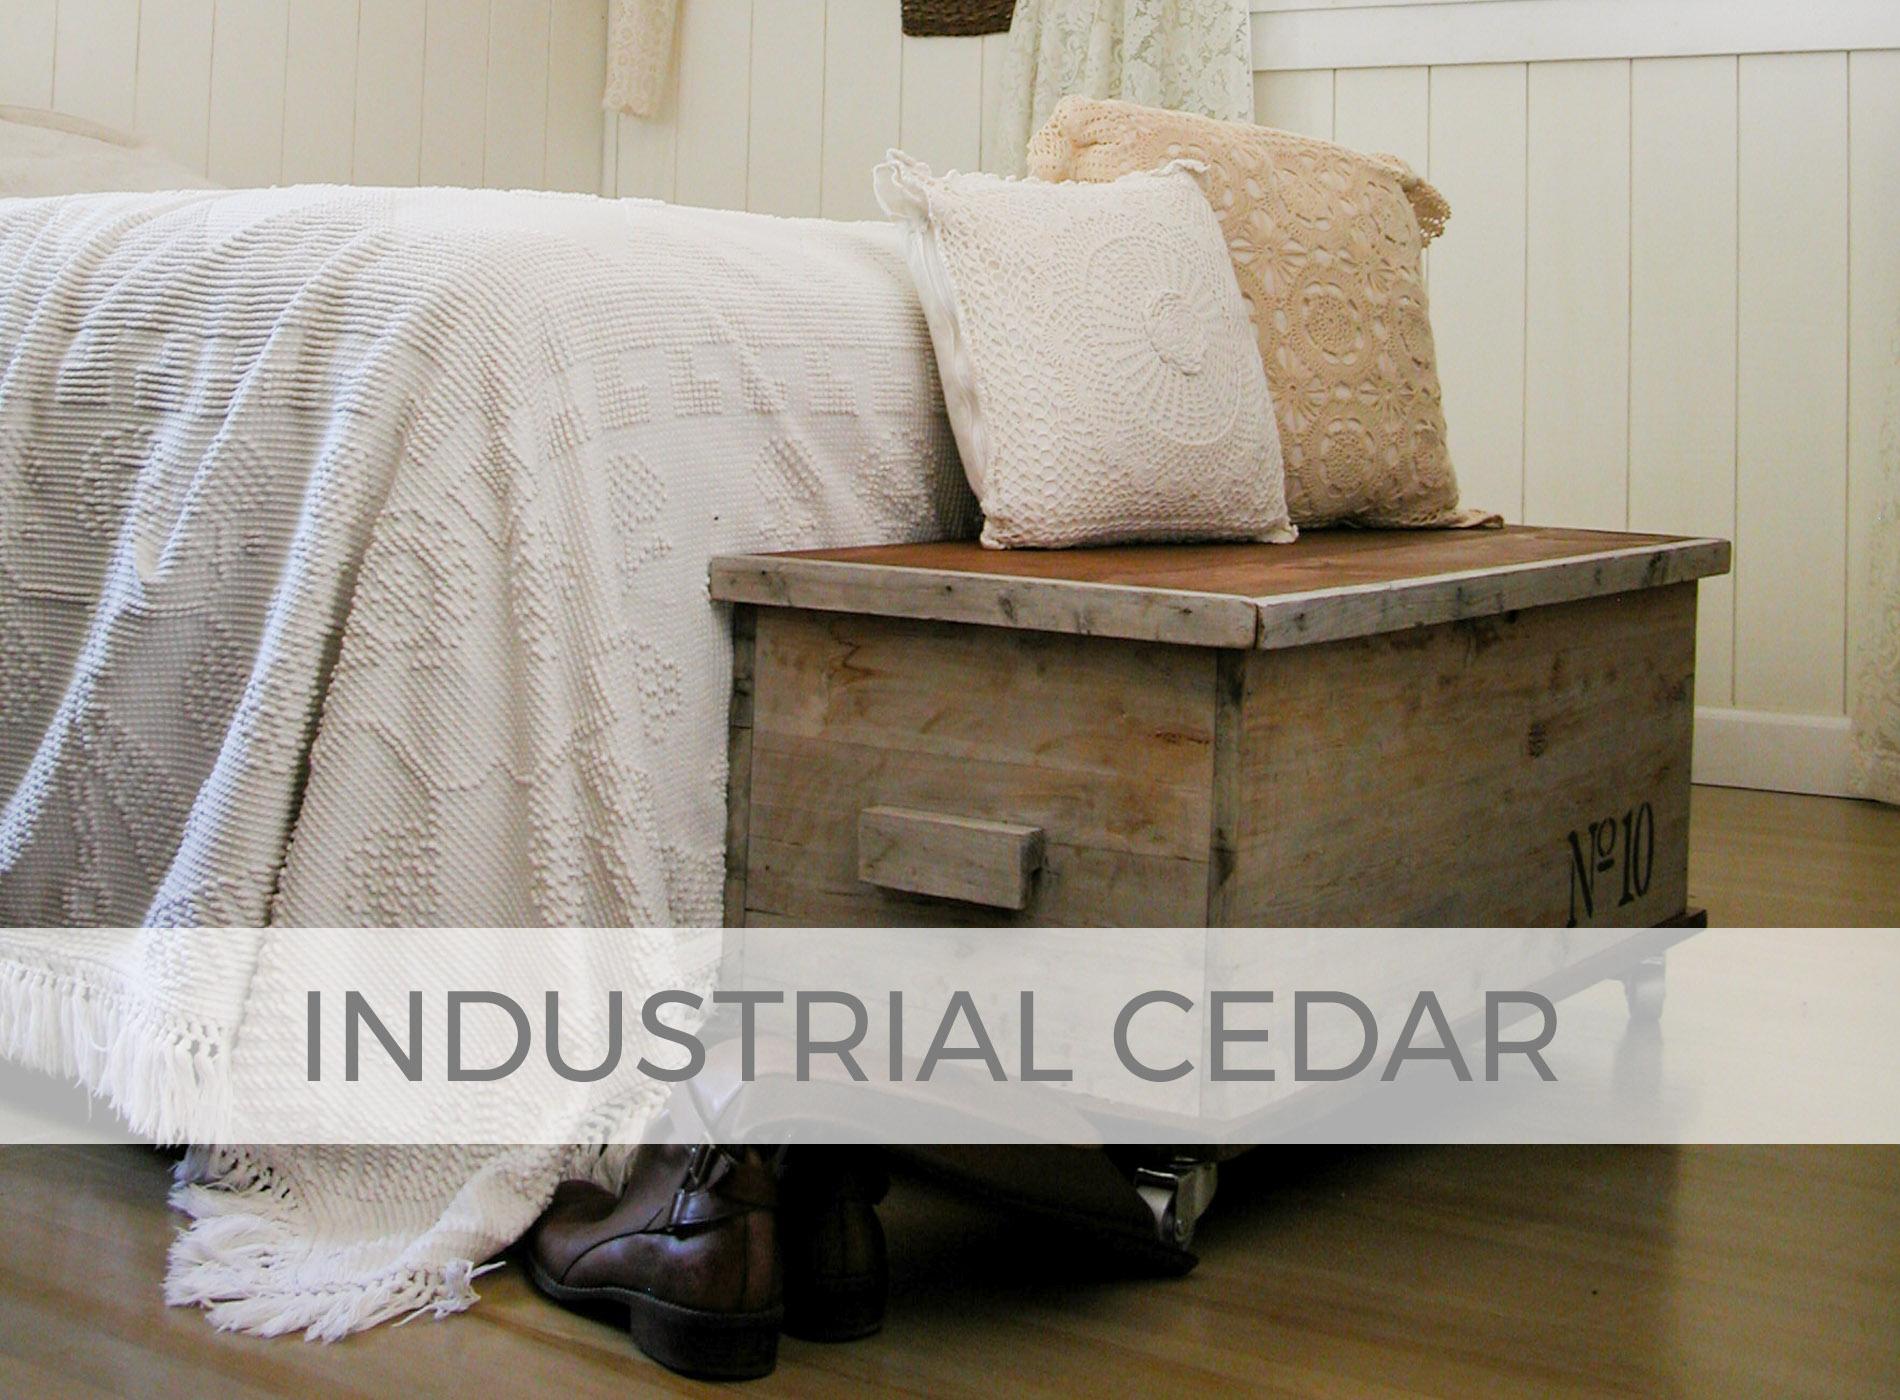 Industrial Cedar Blanket Chest by Larissa of Prodigal Pieces | prodigalpieces.com #prodigalpieces